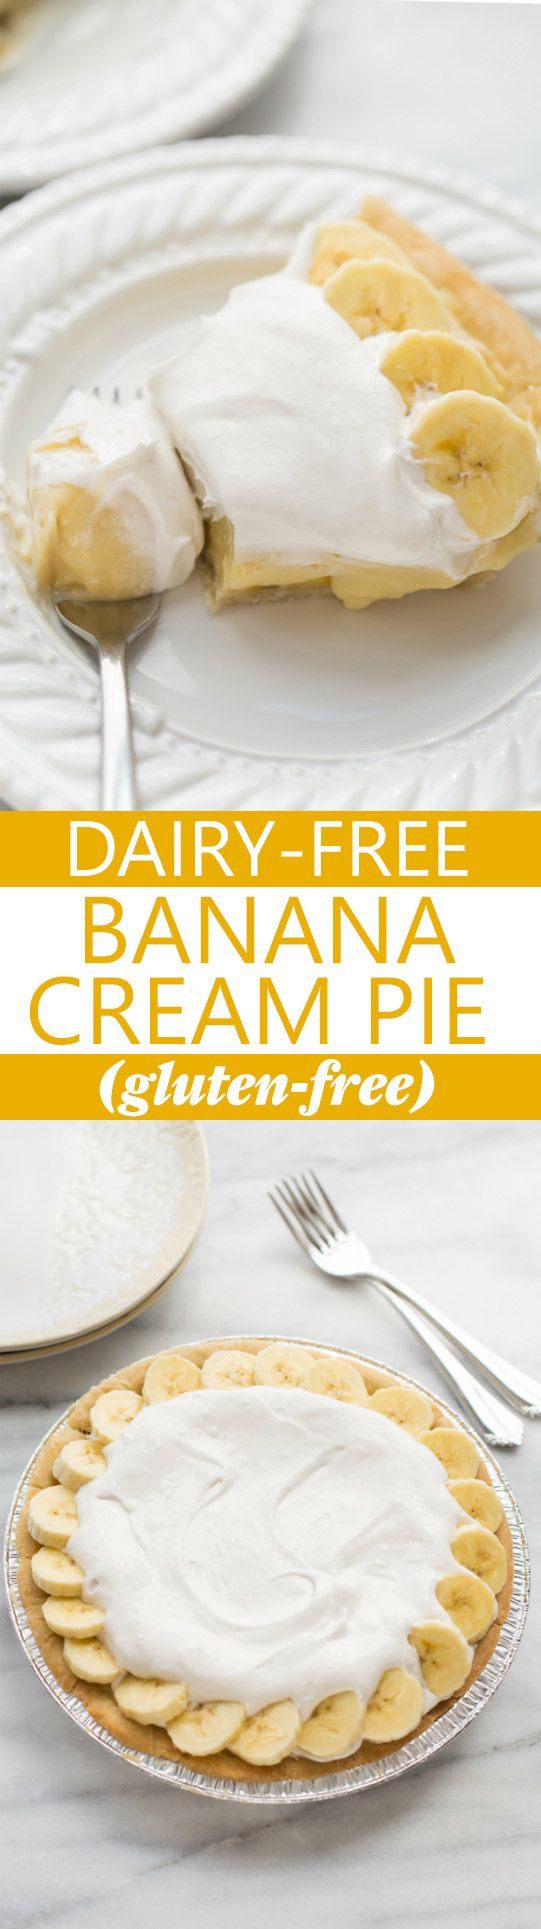 Dairy Free Banana Cream Pie  Best 25 Dairy free snacks ideas on Pinterest